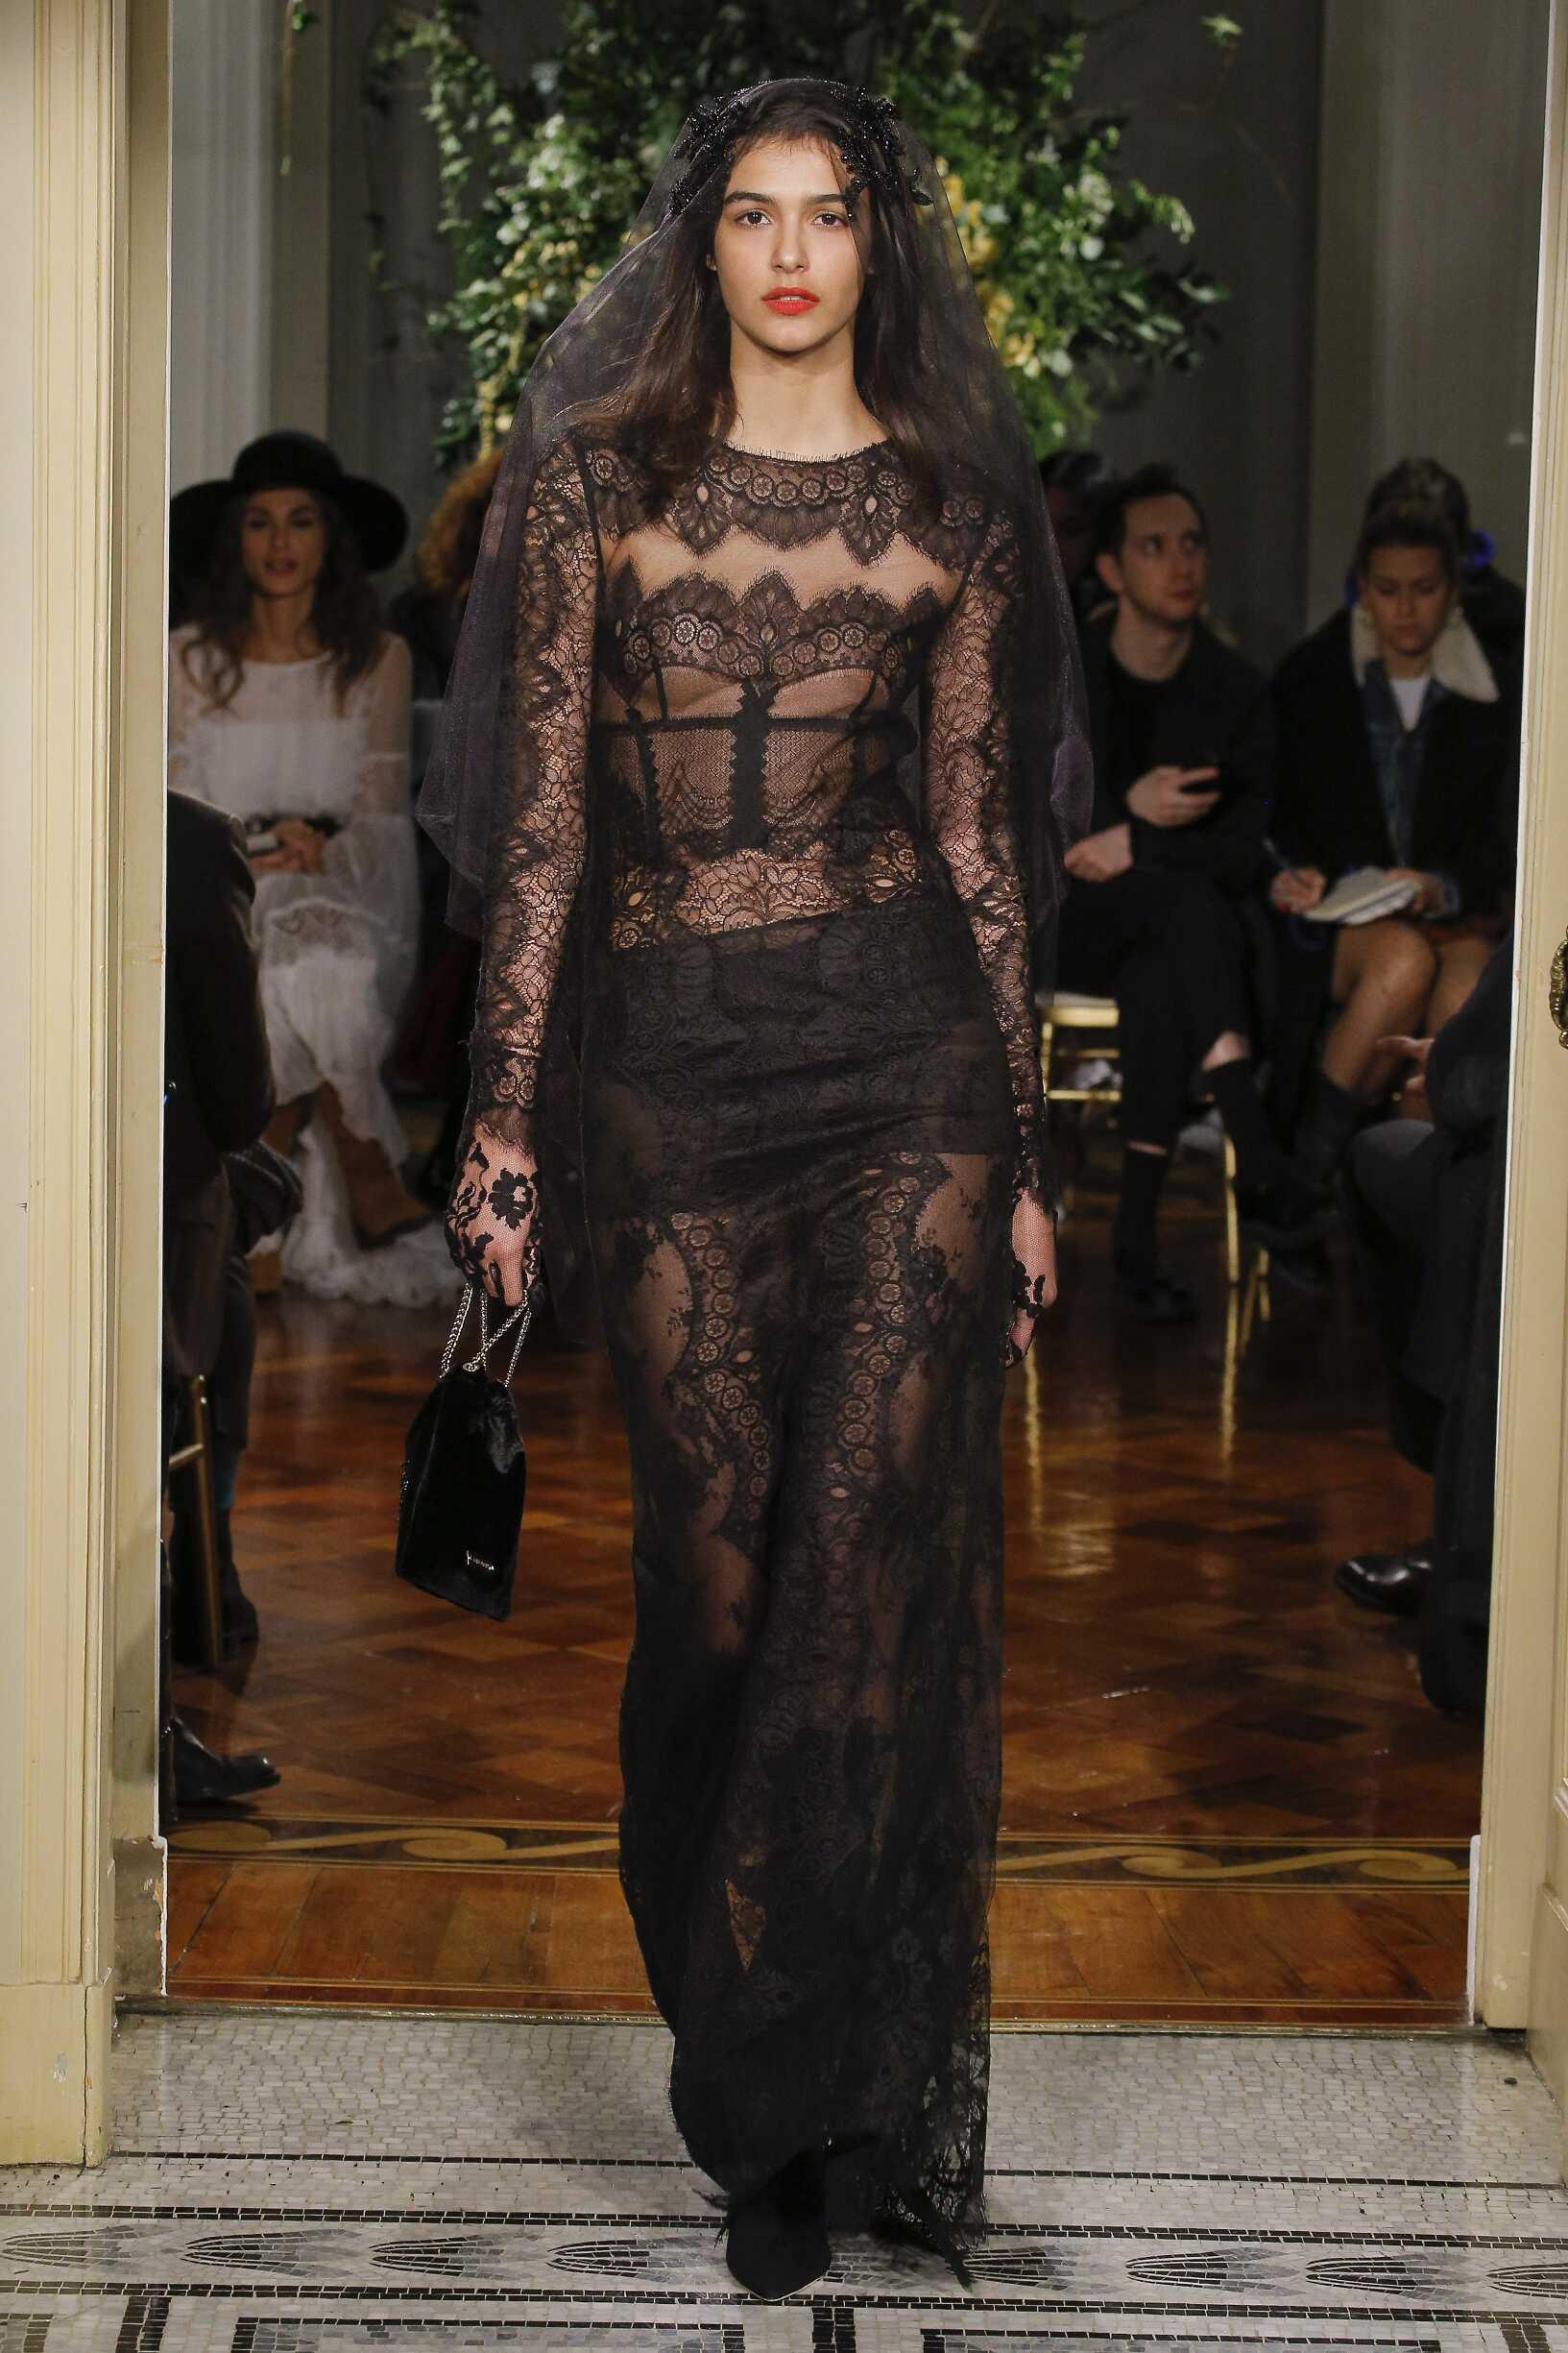 Runway Alberta Ferretti Limited Edition 2017 Women's Collection Milan Fashion Week